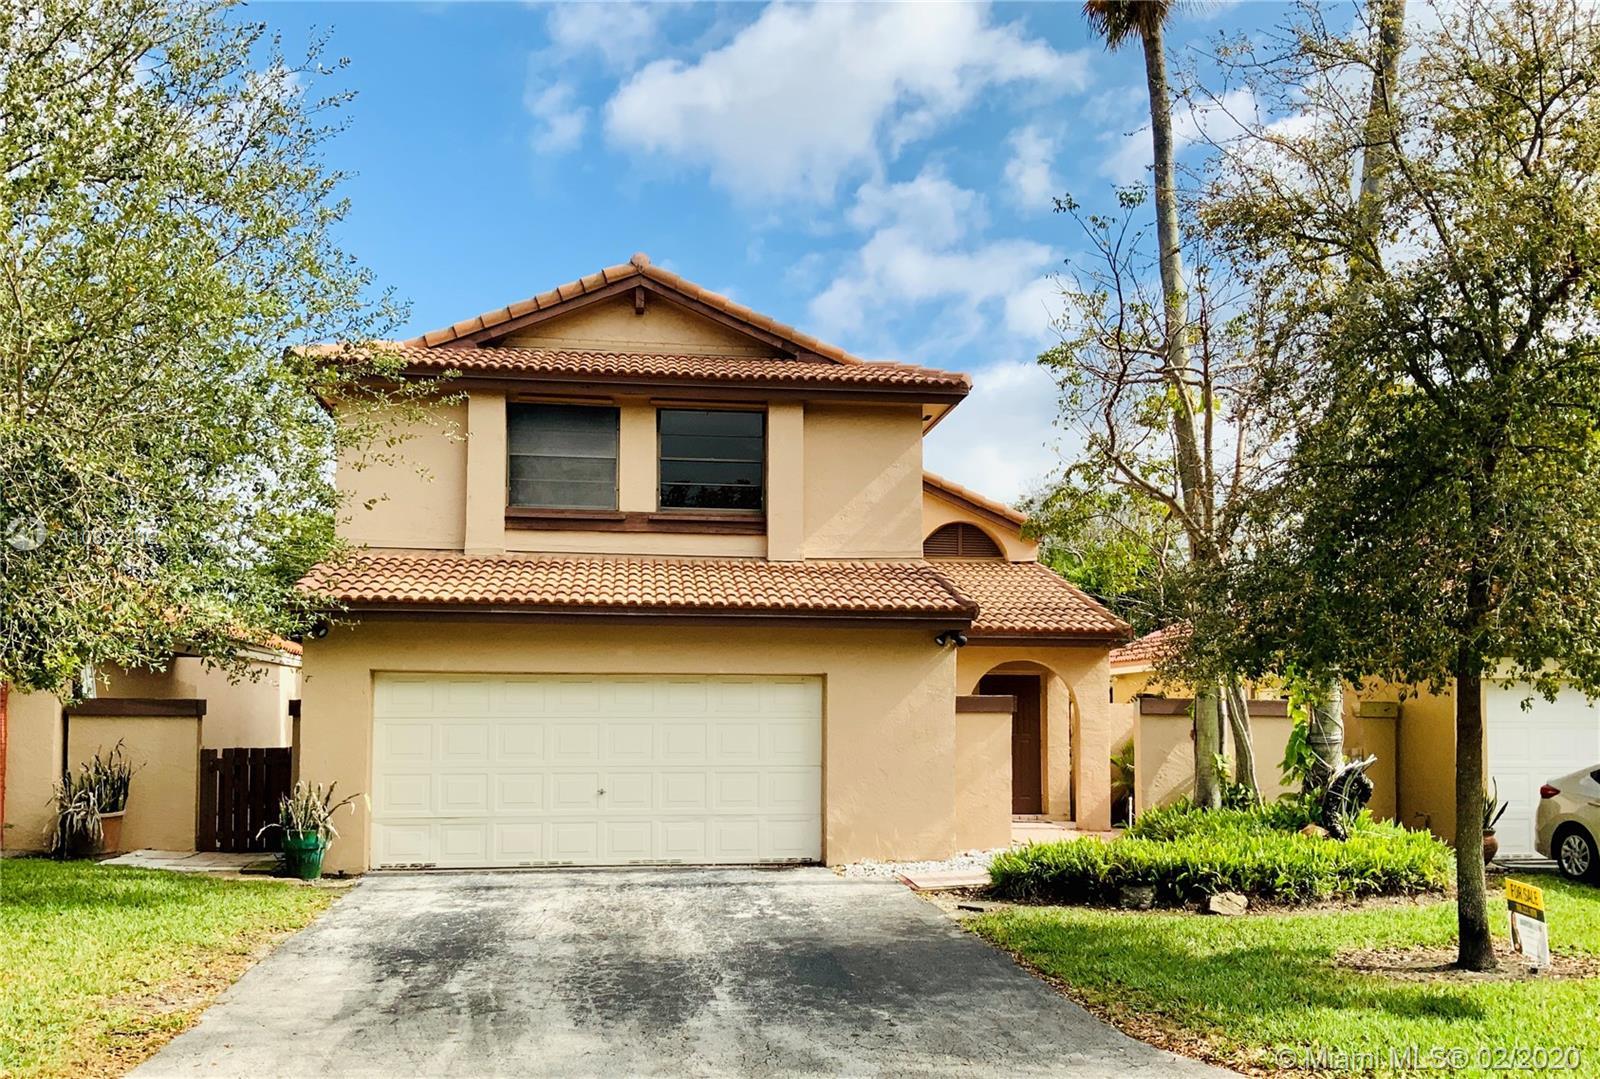 6305 NW 173rd Ln, Hialeah, FL 33015 - Hialeah, FL real estate listing